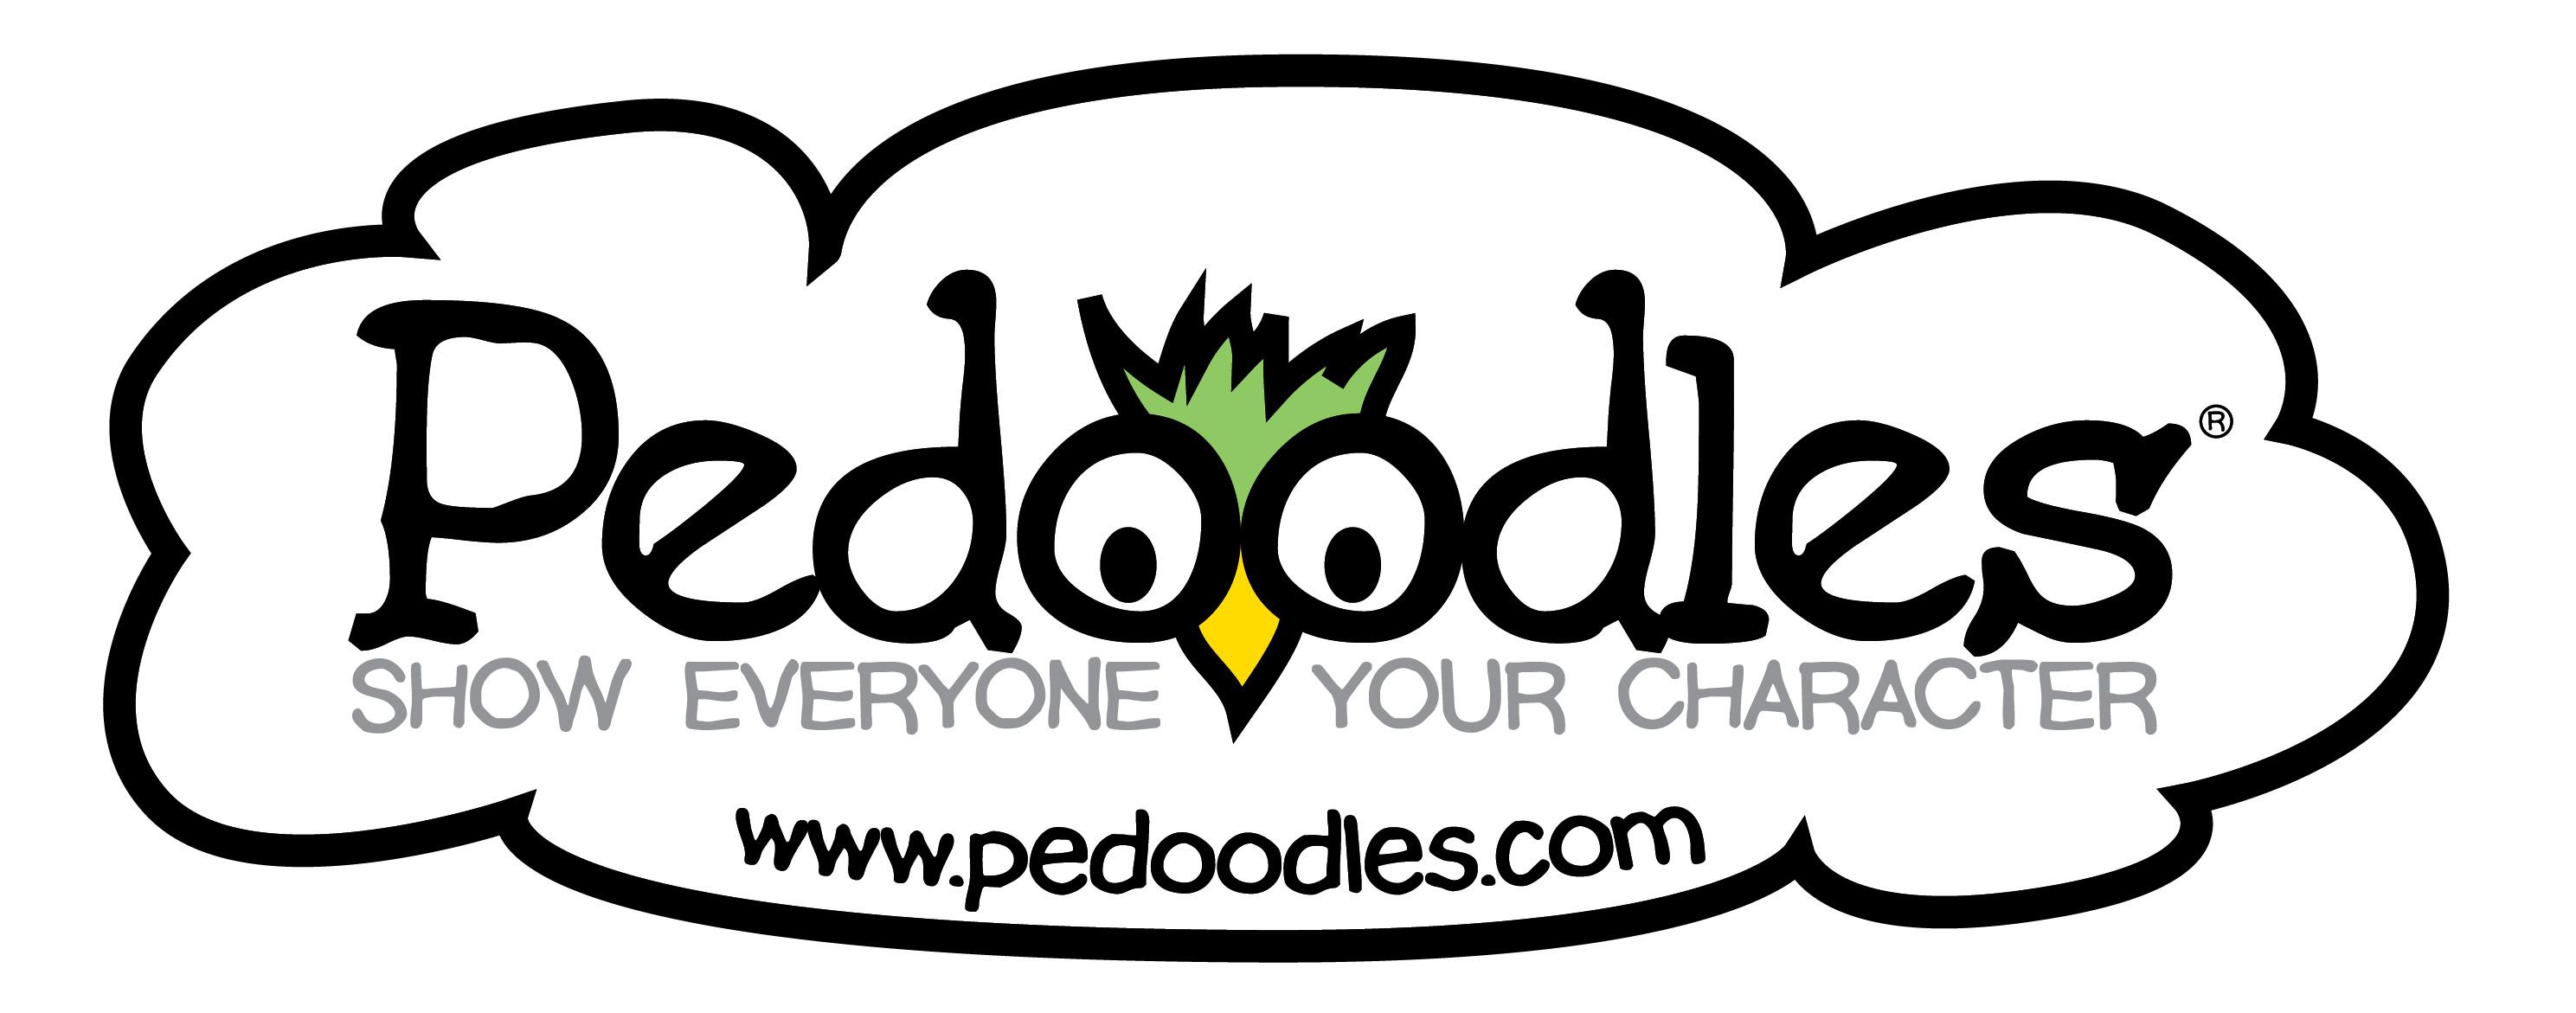 Pedoodles